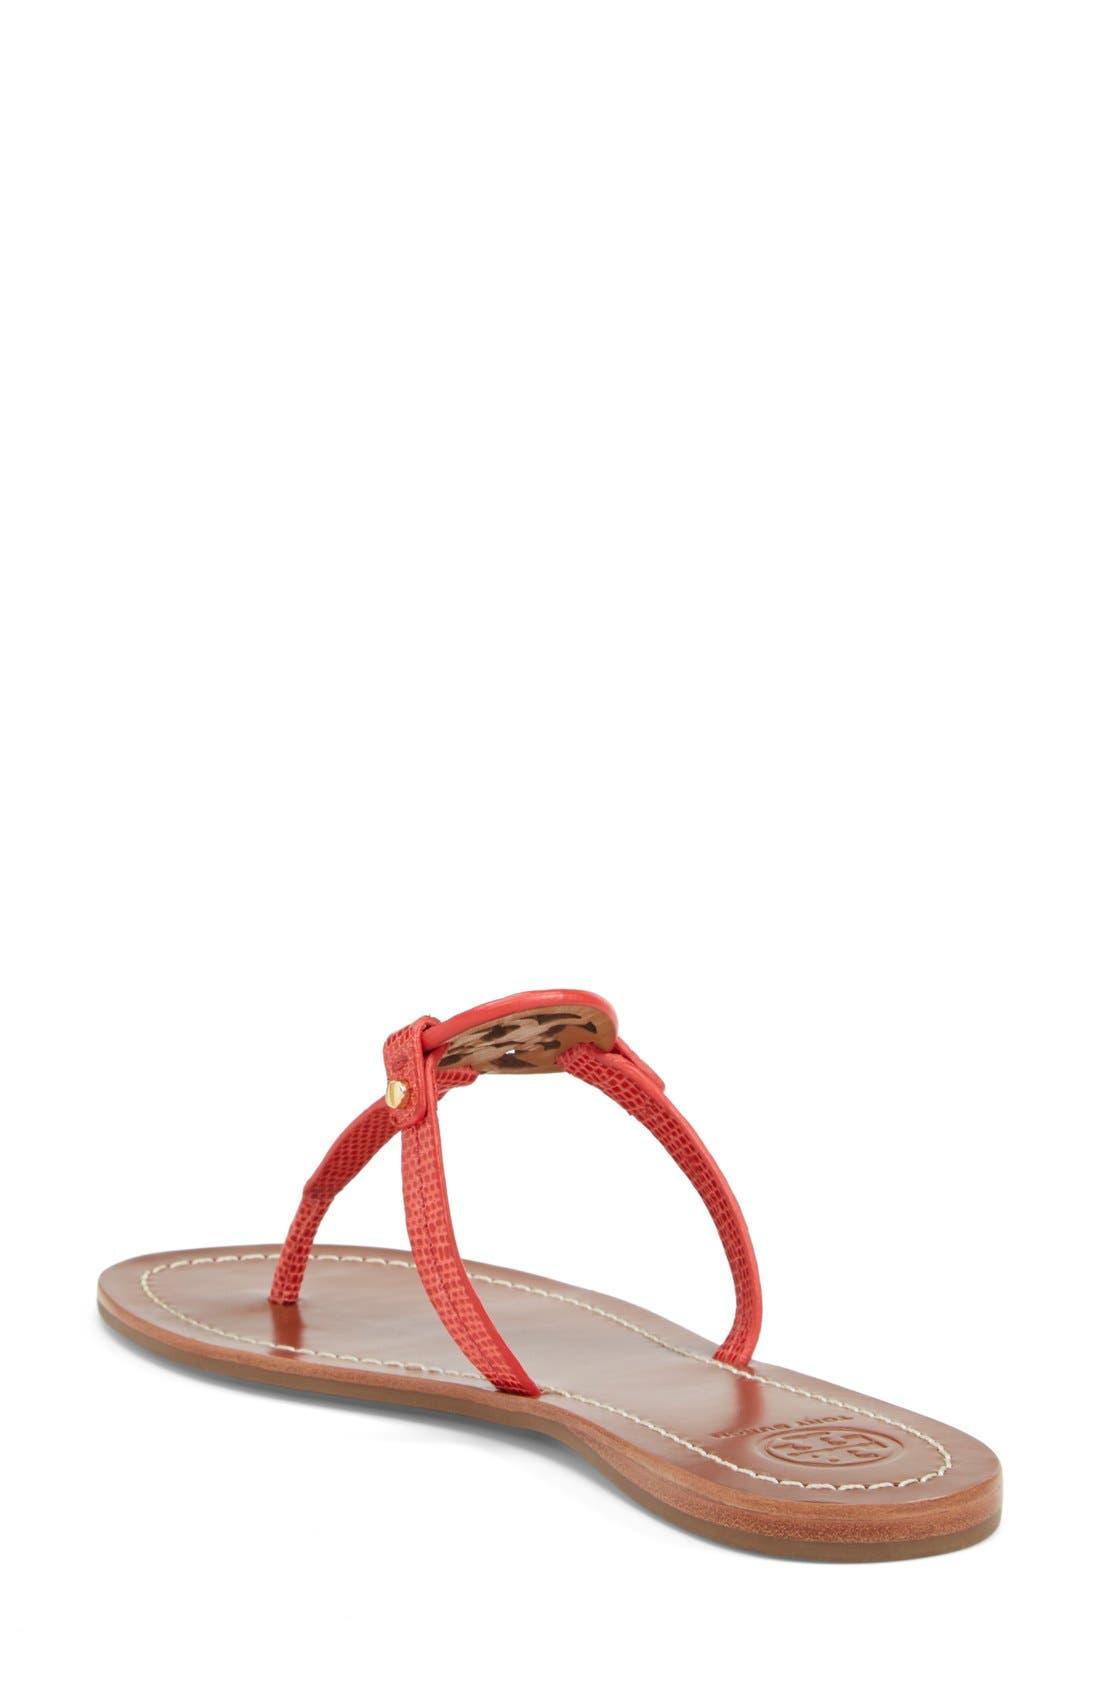 Alternate Image 2  - Tory Burch 'Mini Miller' Leather Thong Sandal (Women)